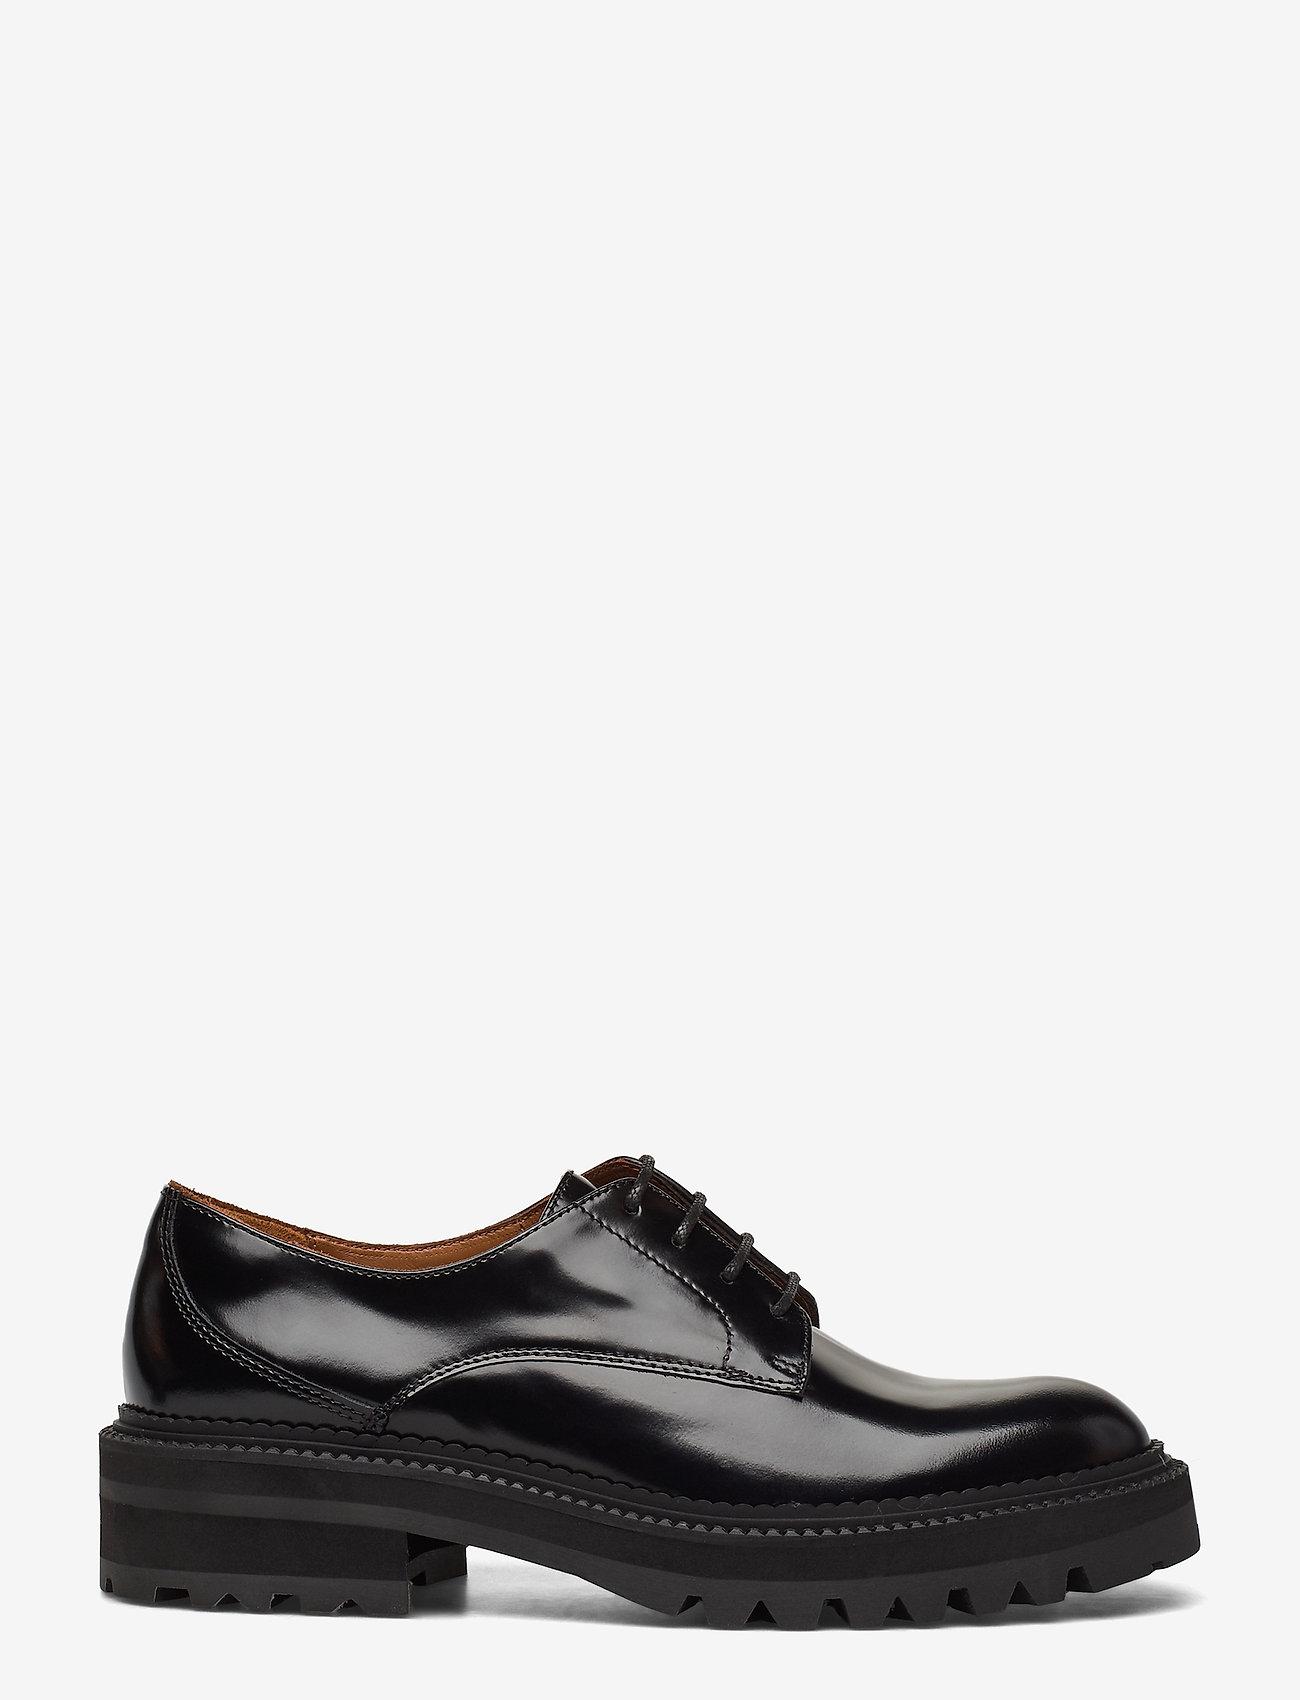 Billi Bi - Shoes 14717 - buty sznurowane - black polido  900 - 1